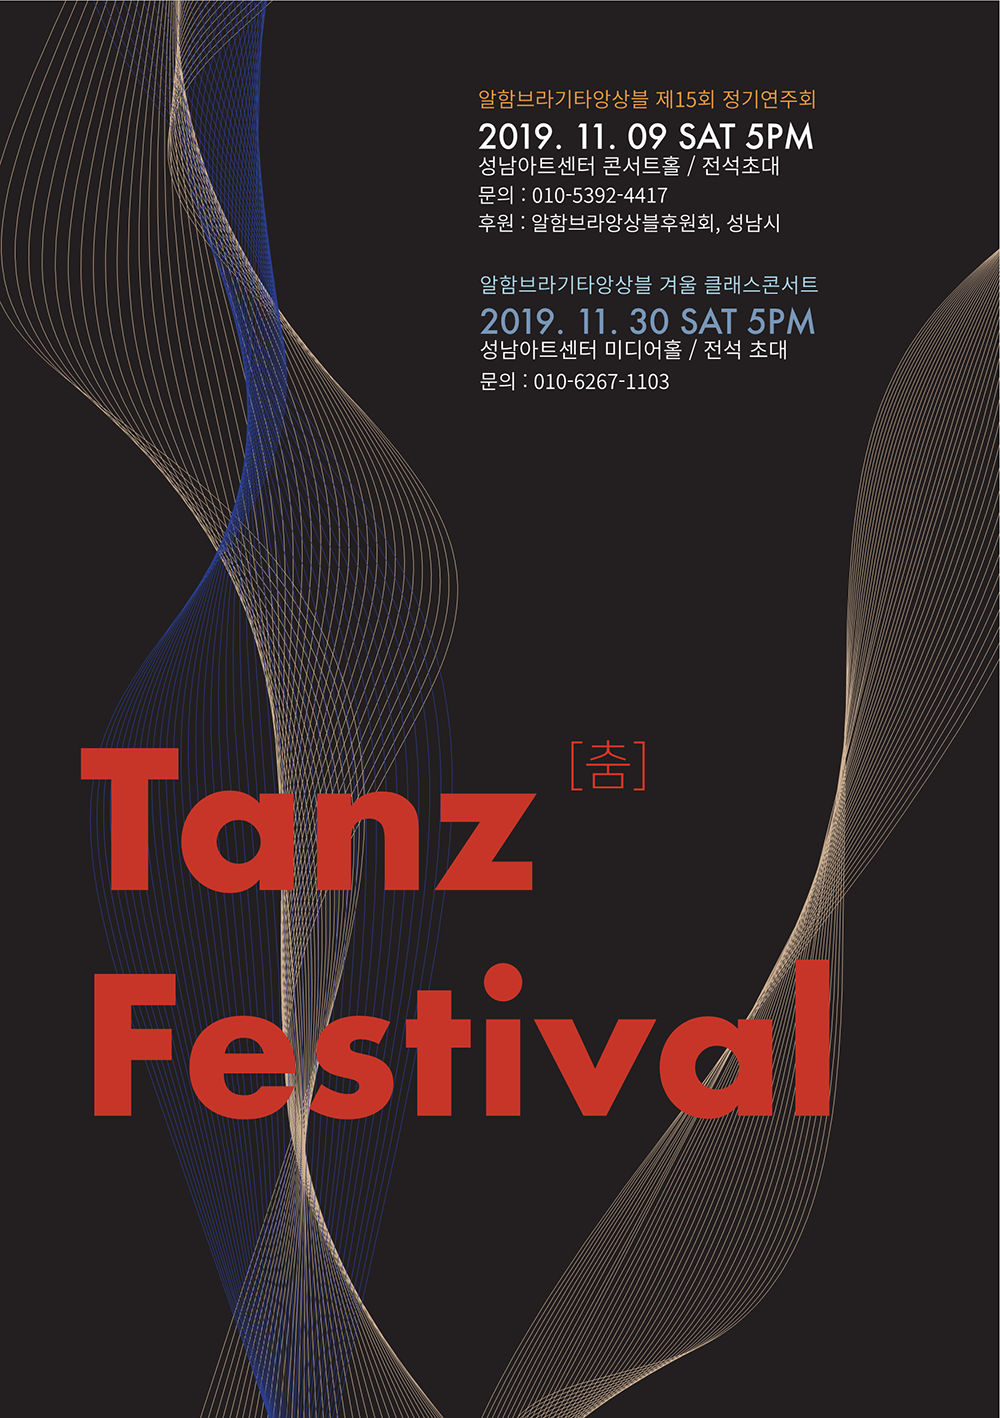 alhambra_2019_tanz_festival_final_20191016_1.png